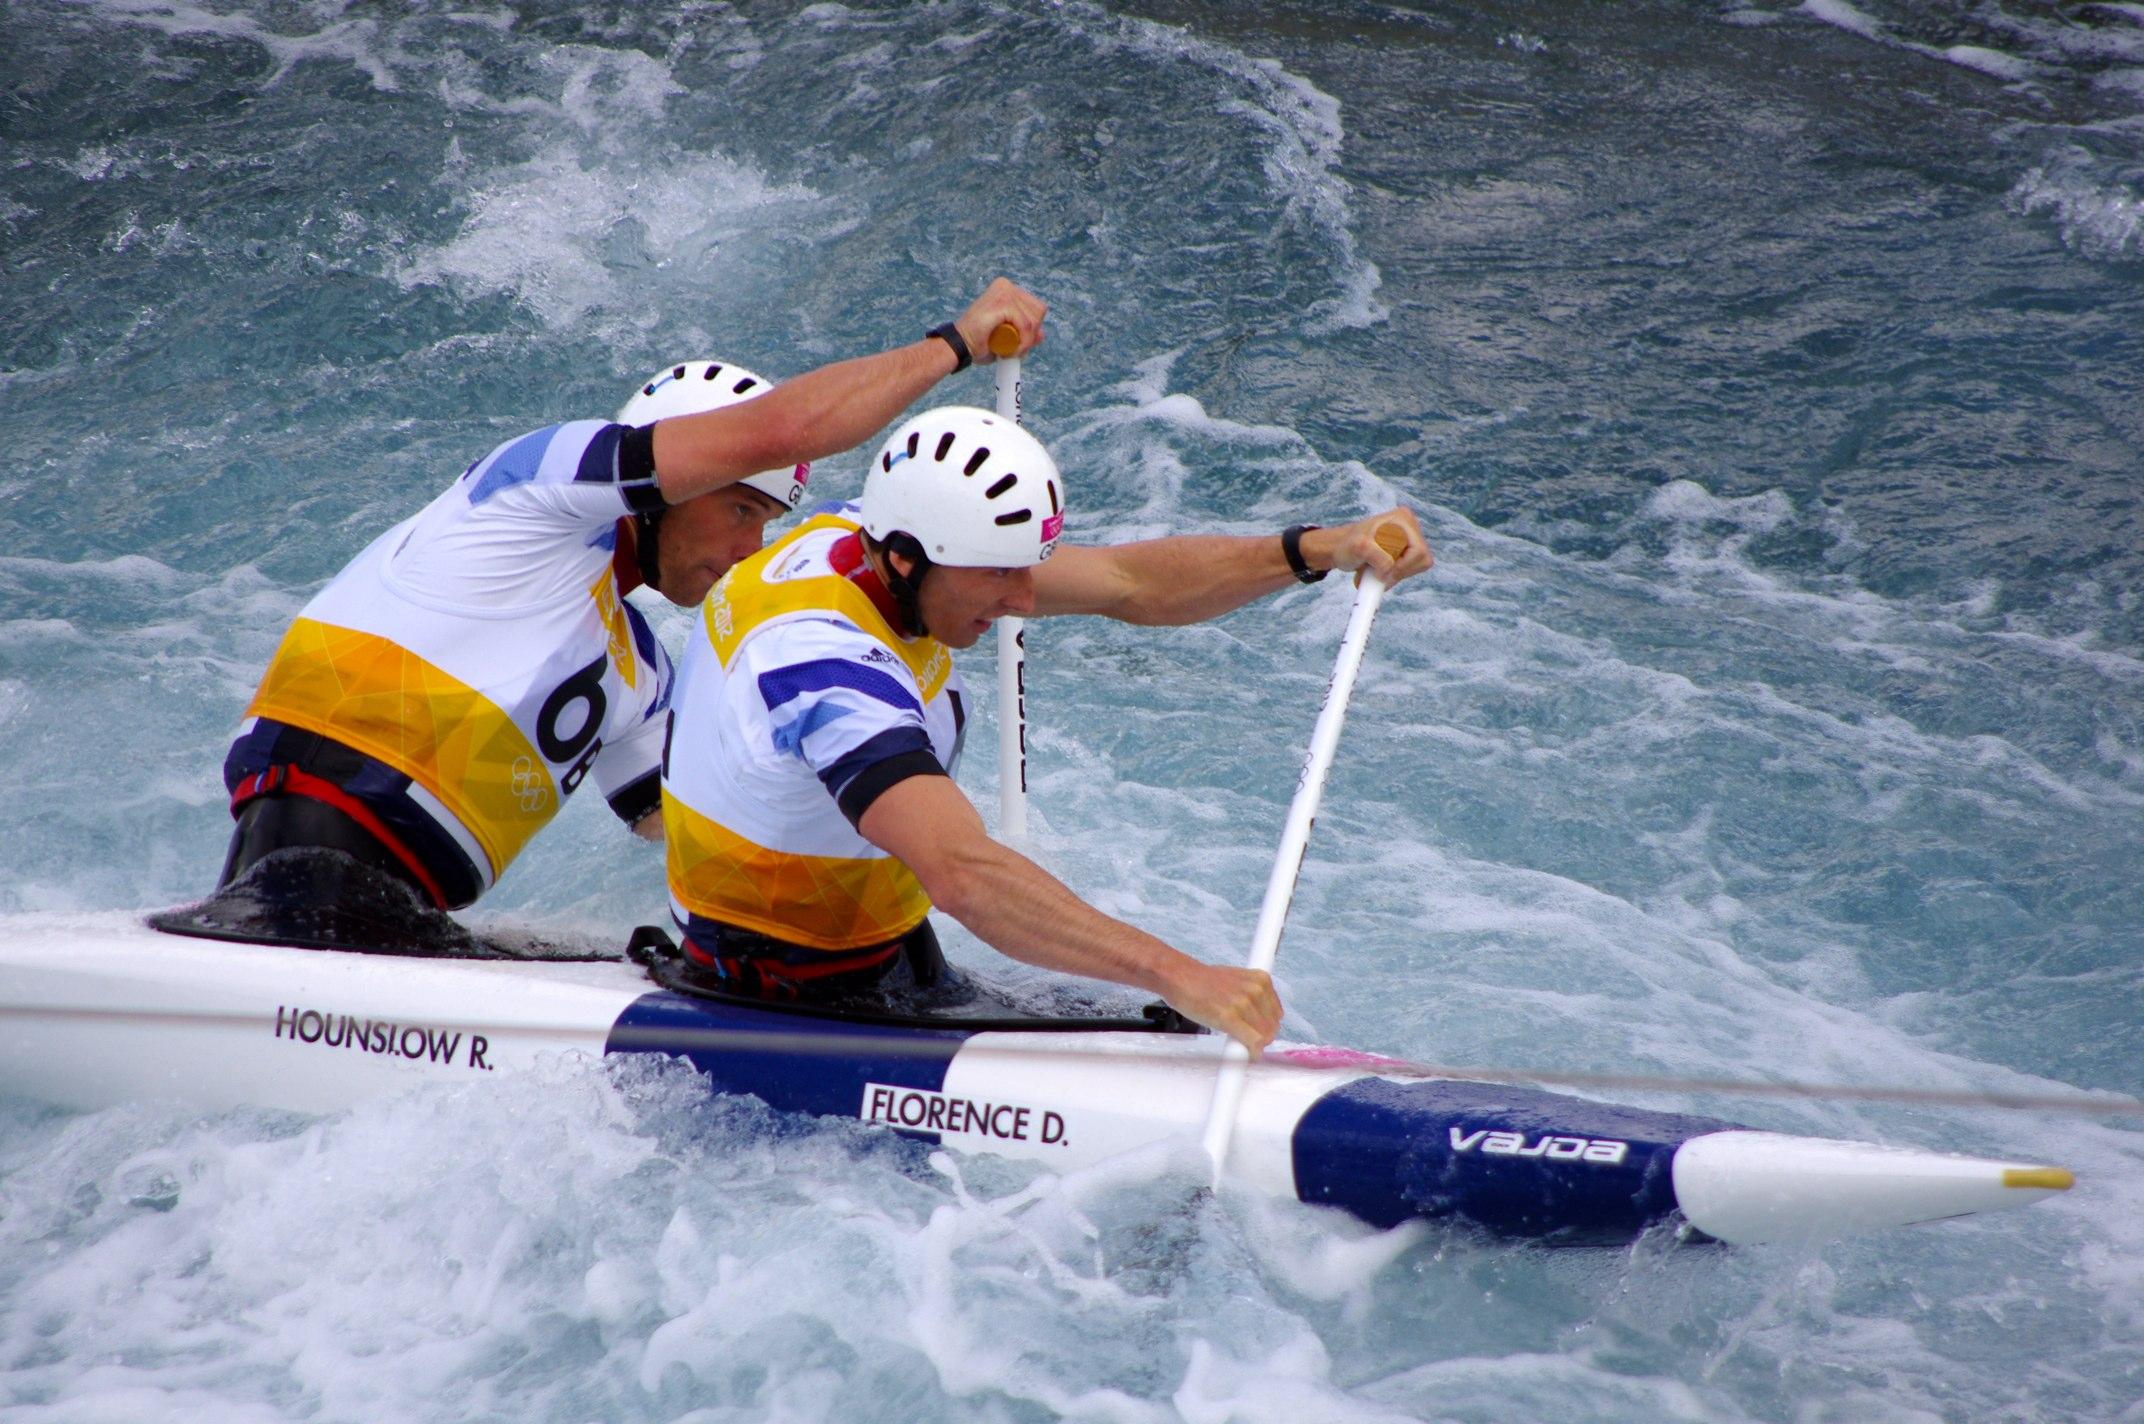 FileSlalom Canoeing 2012 Olympics C2 GBR David Florence And Richard Hounslow